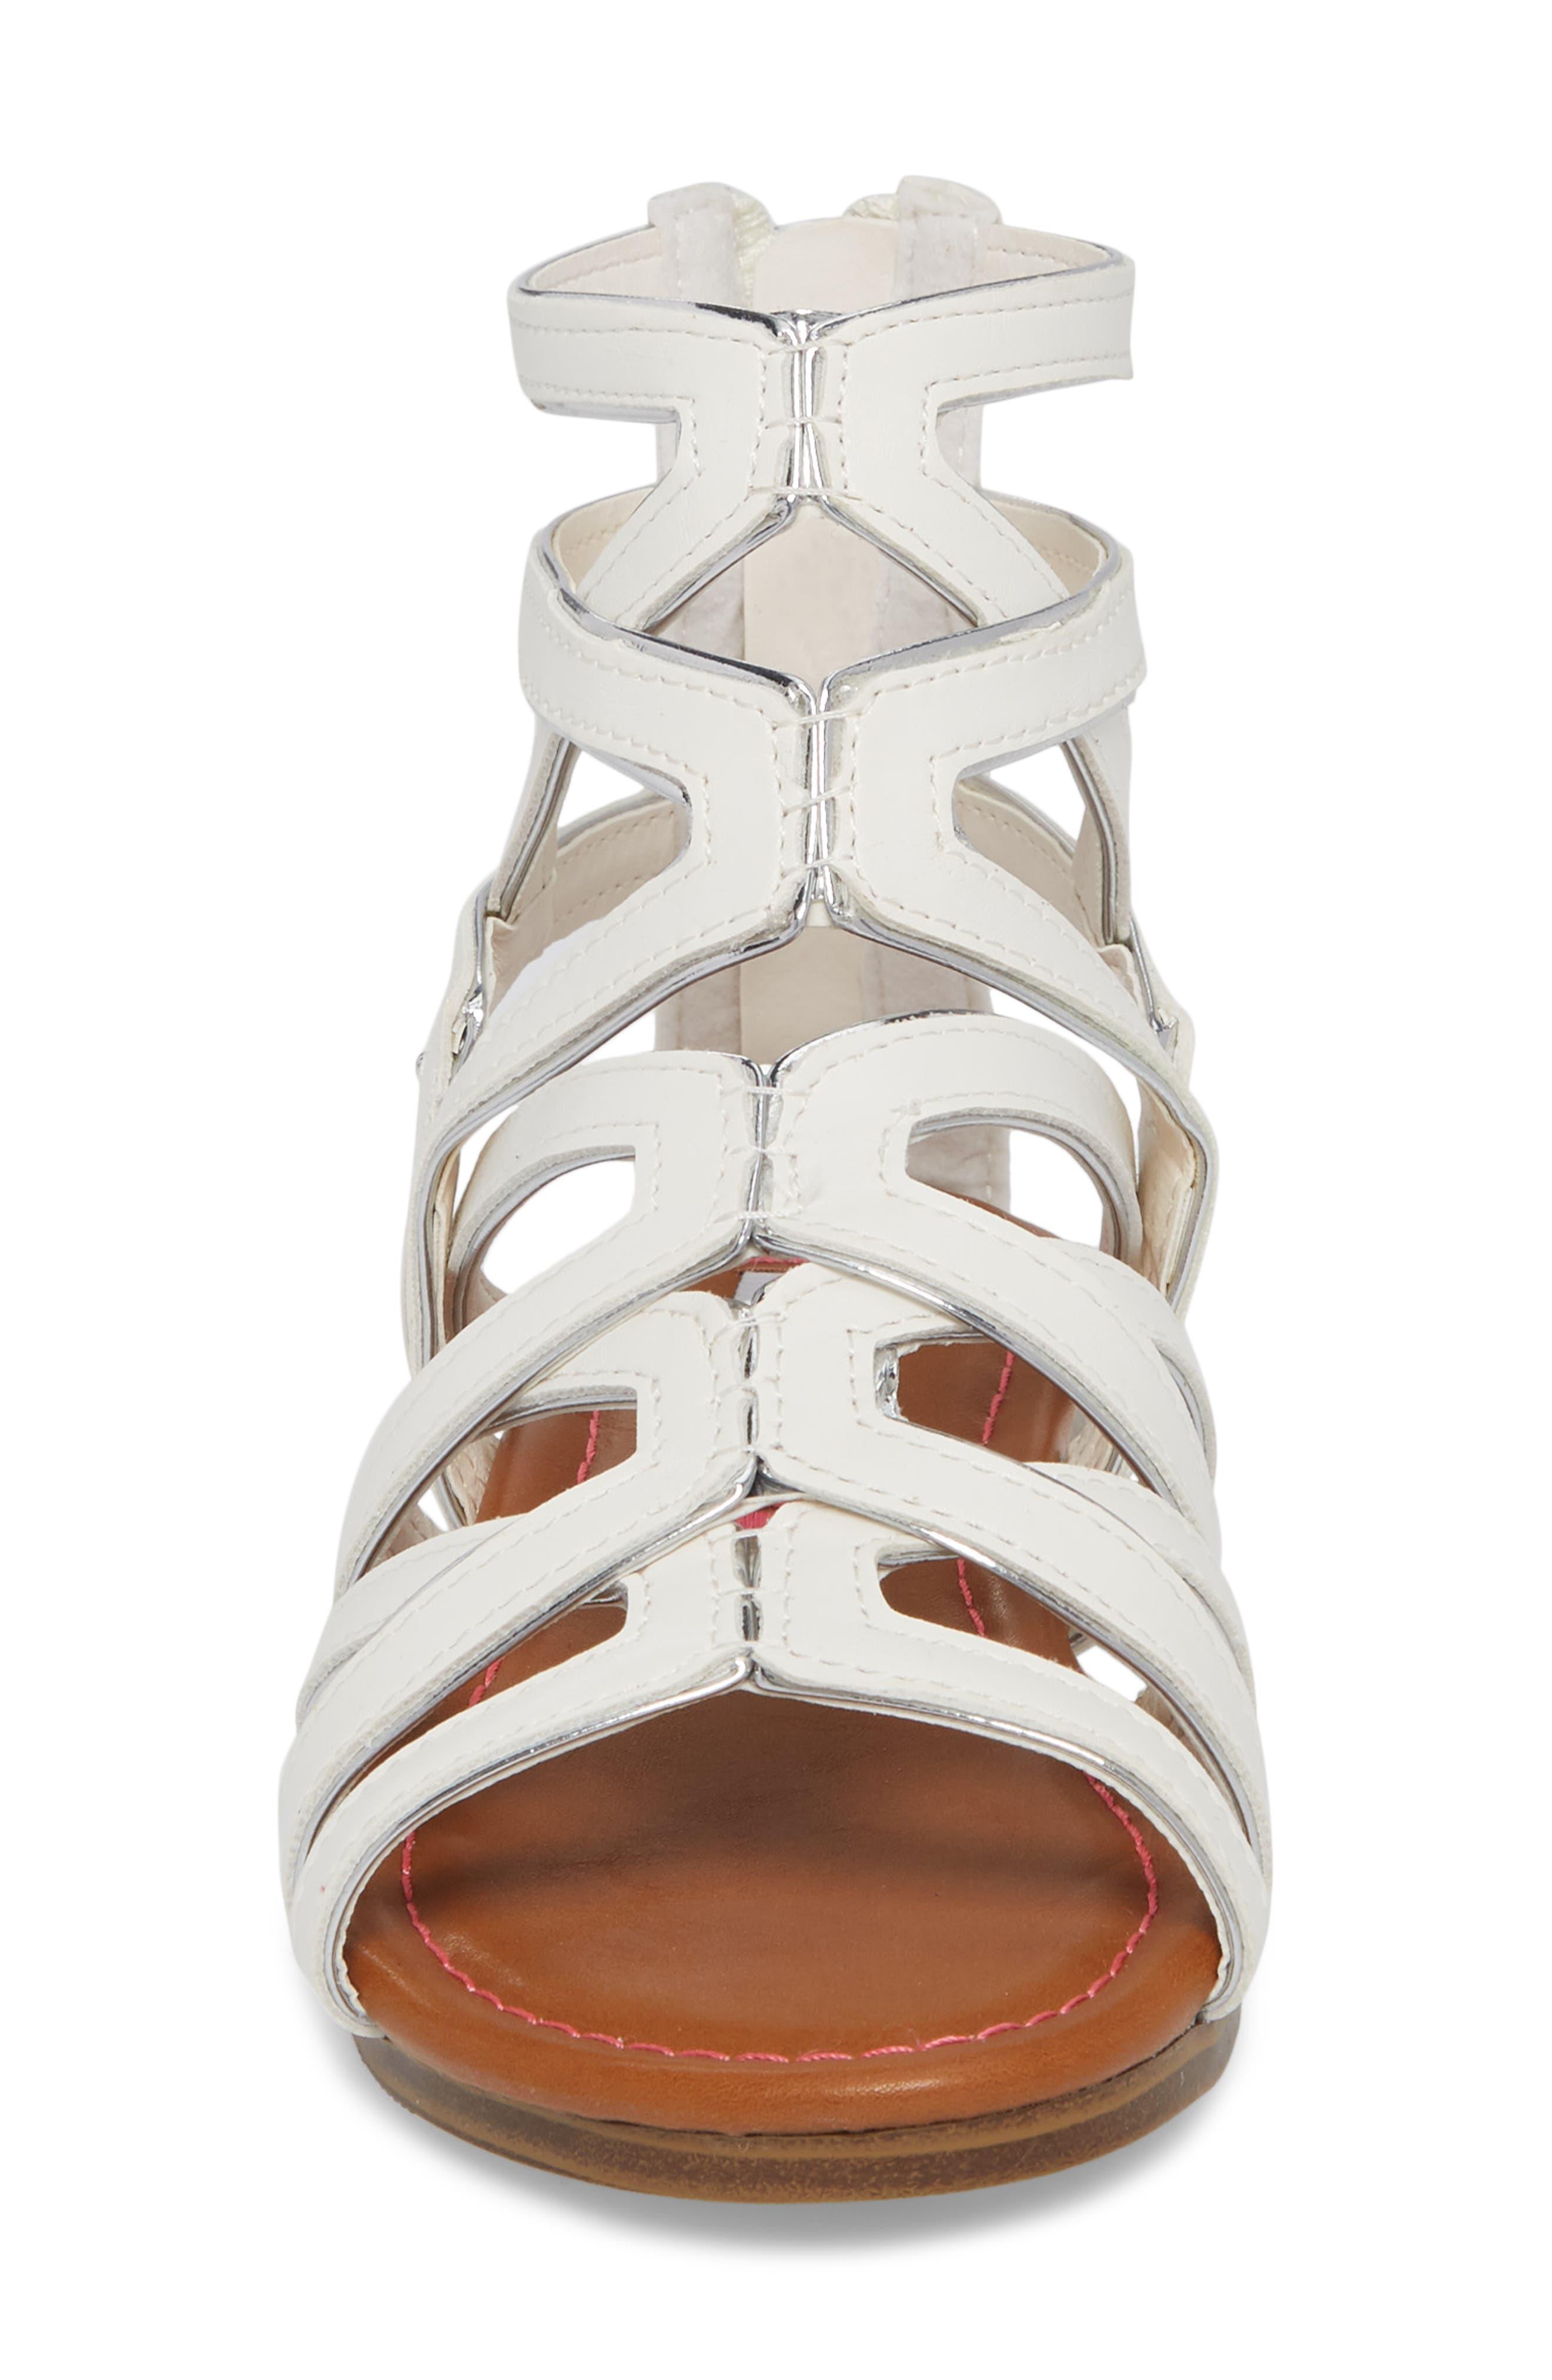 Jessence Gladiator Sandal,                             Alternate thumbnail 4, color,                             White